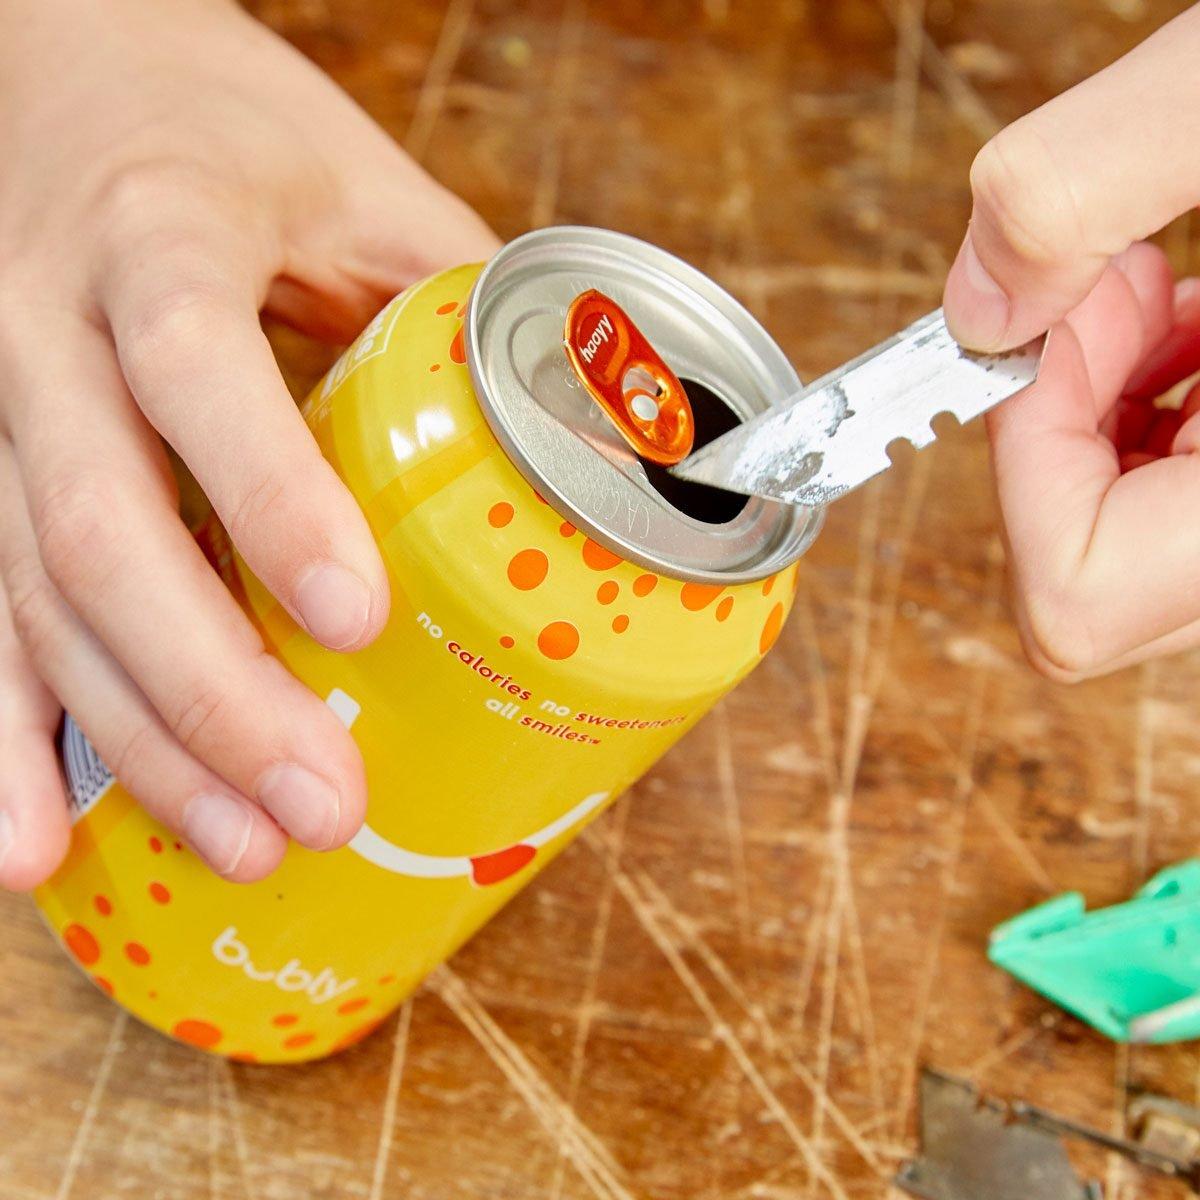 HH Safe blade disposal handy hint pop can utility blade